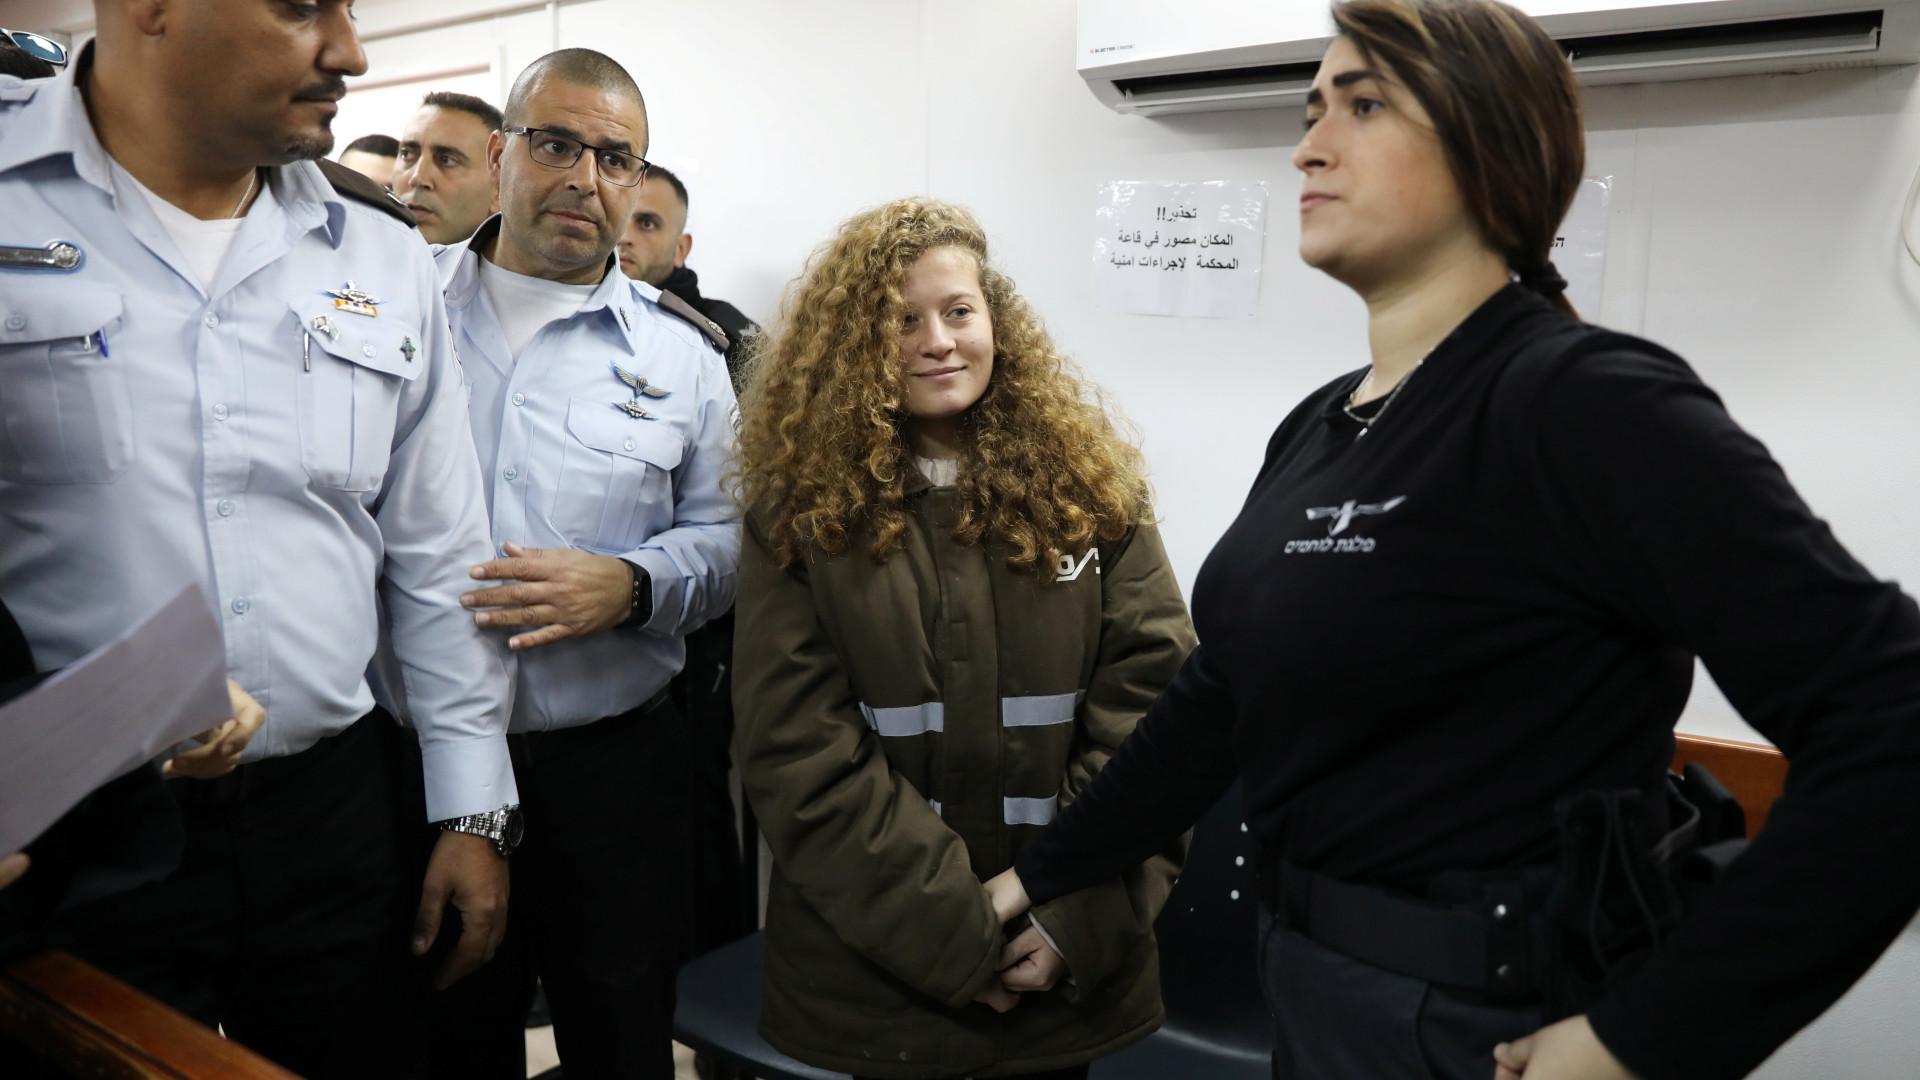 Ahed Tamimi, a menina que esbofeteou militar, começa hoje a ser julgada